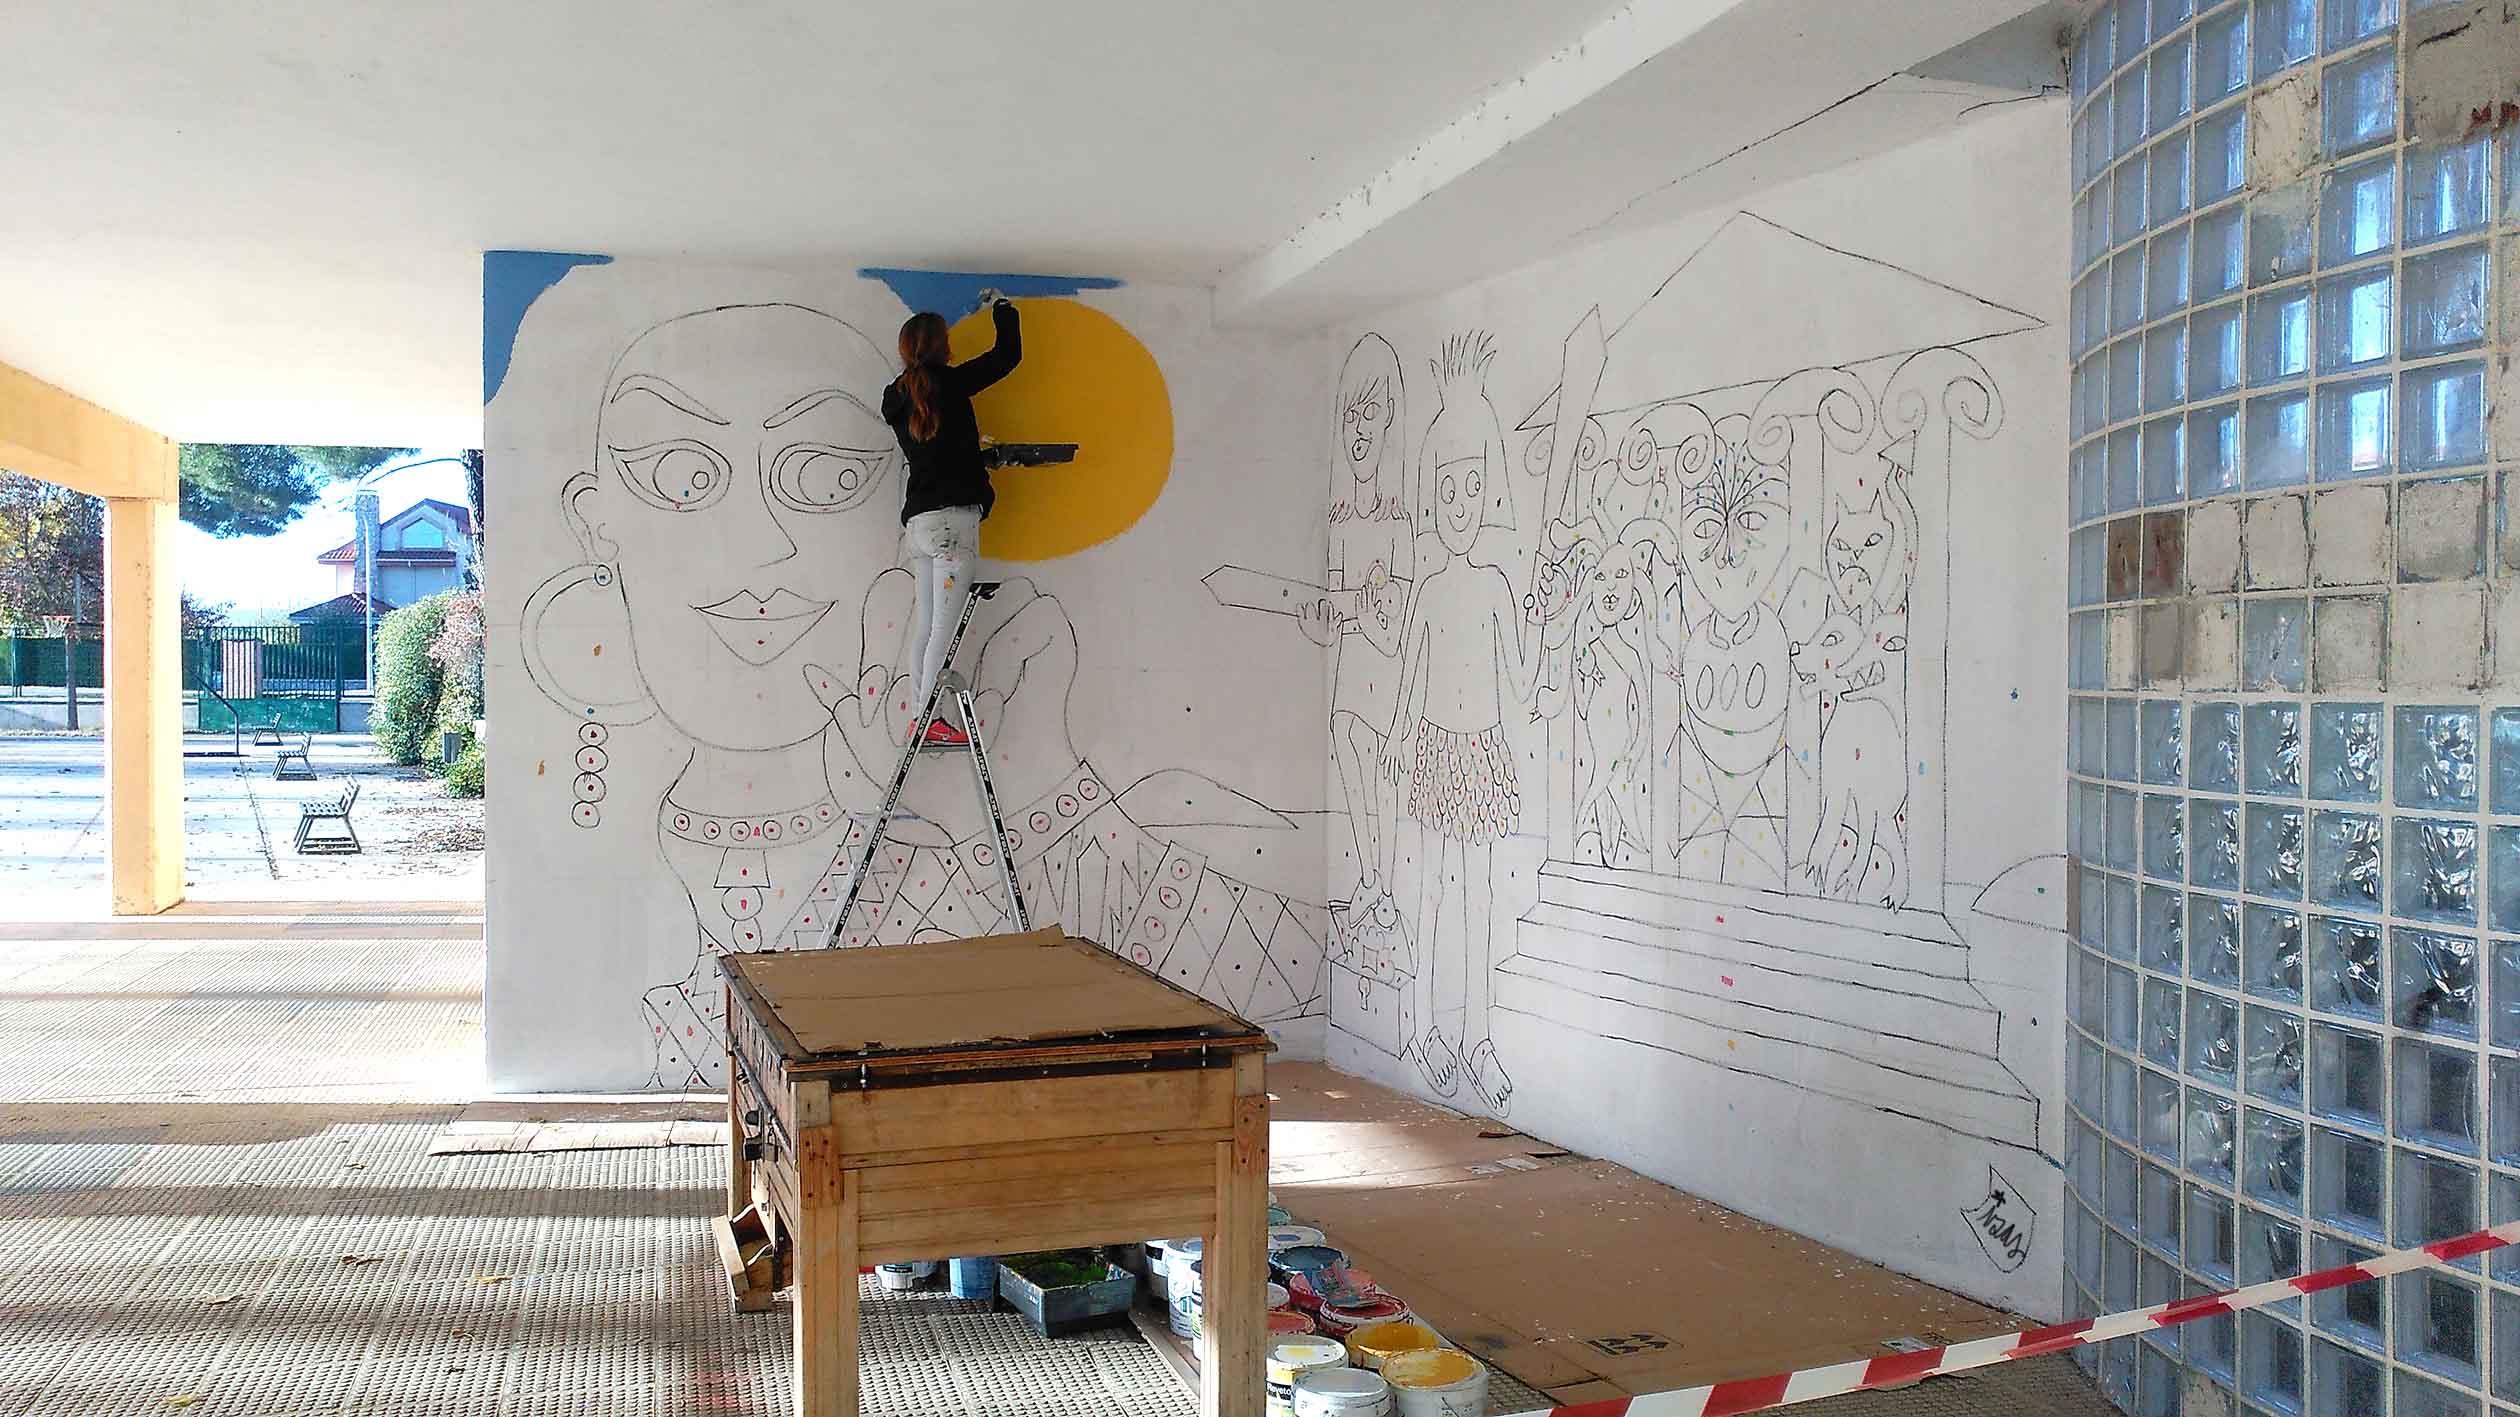 mural izas dibujando la palabra palencia 7